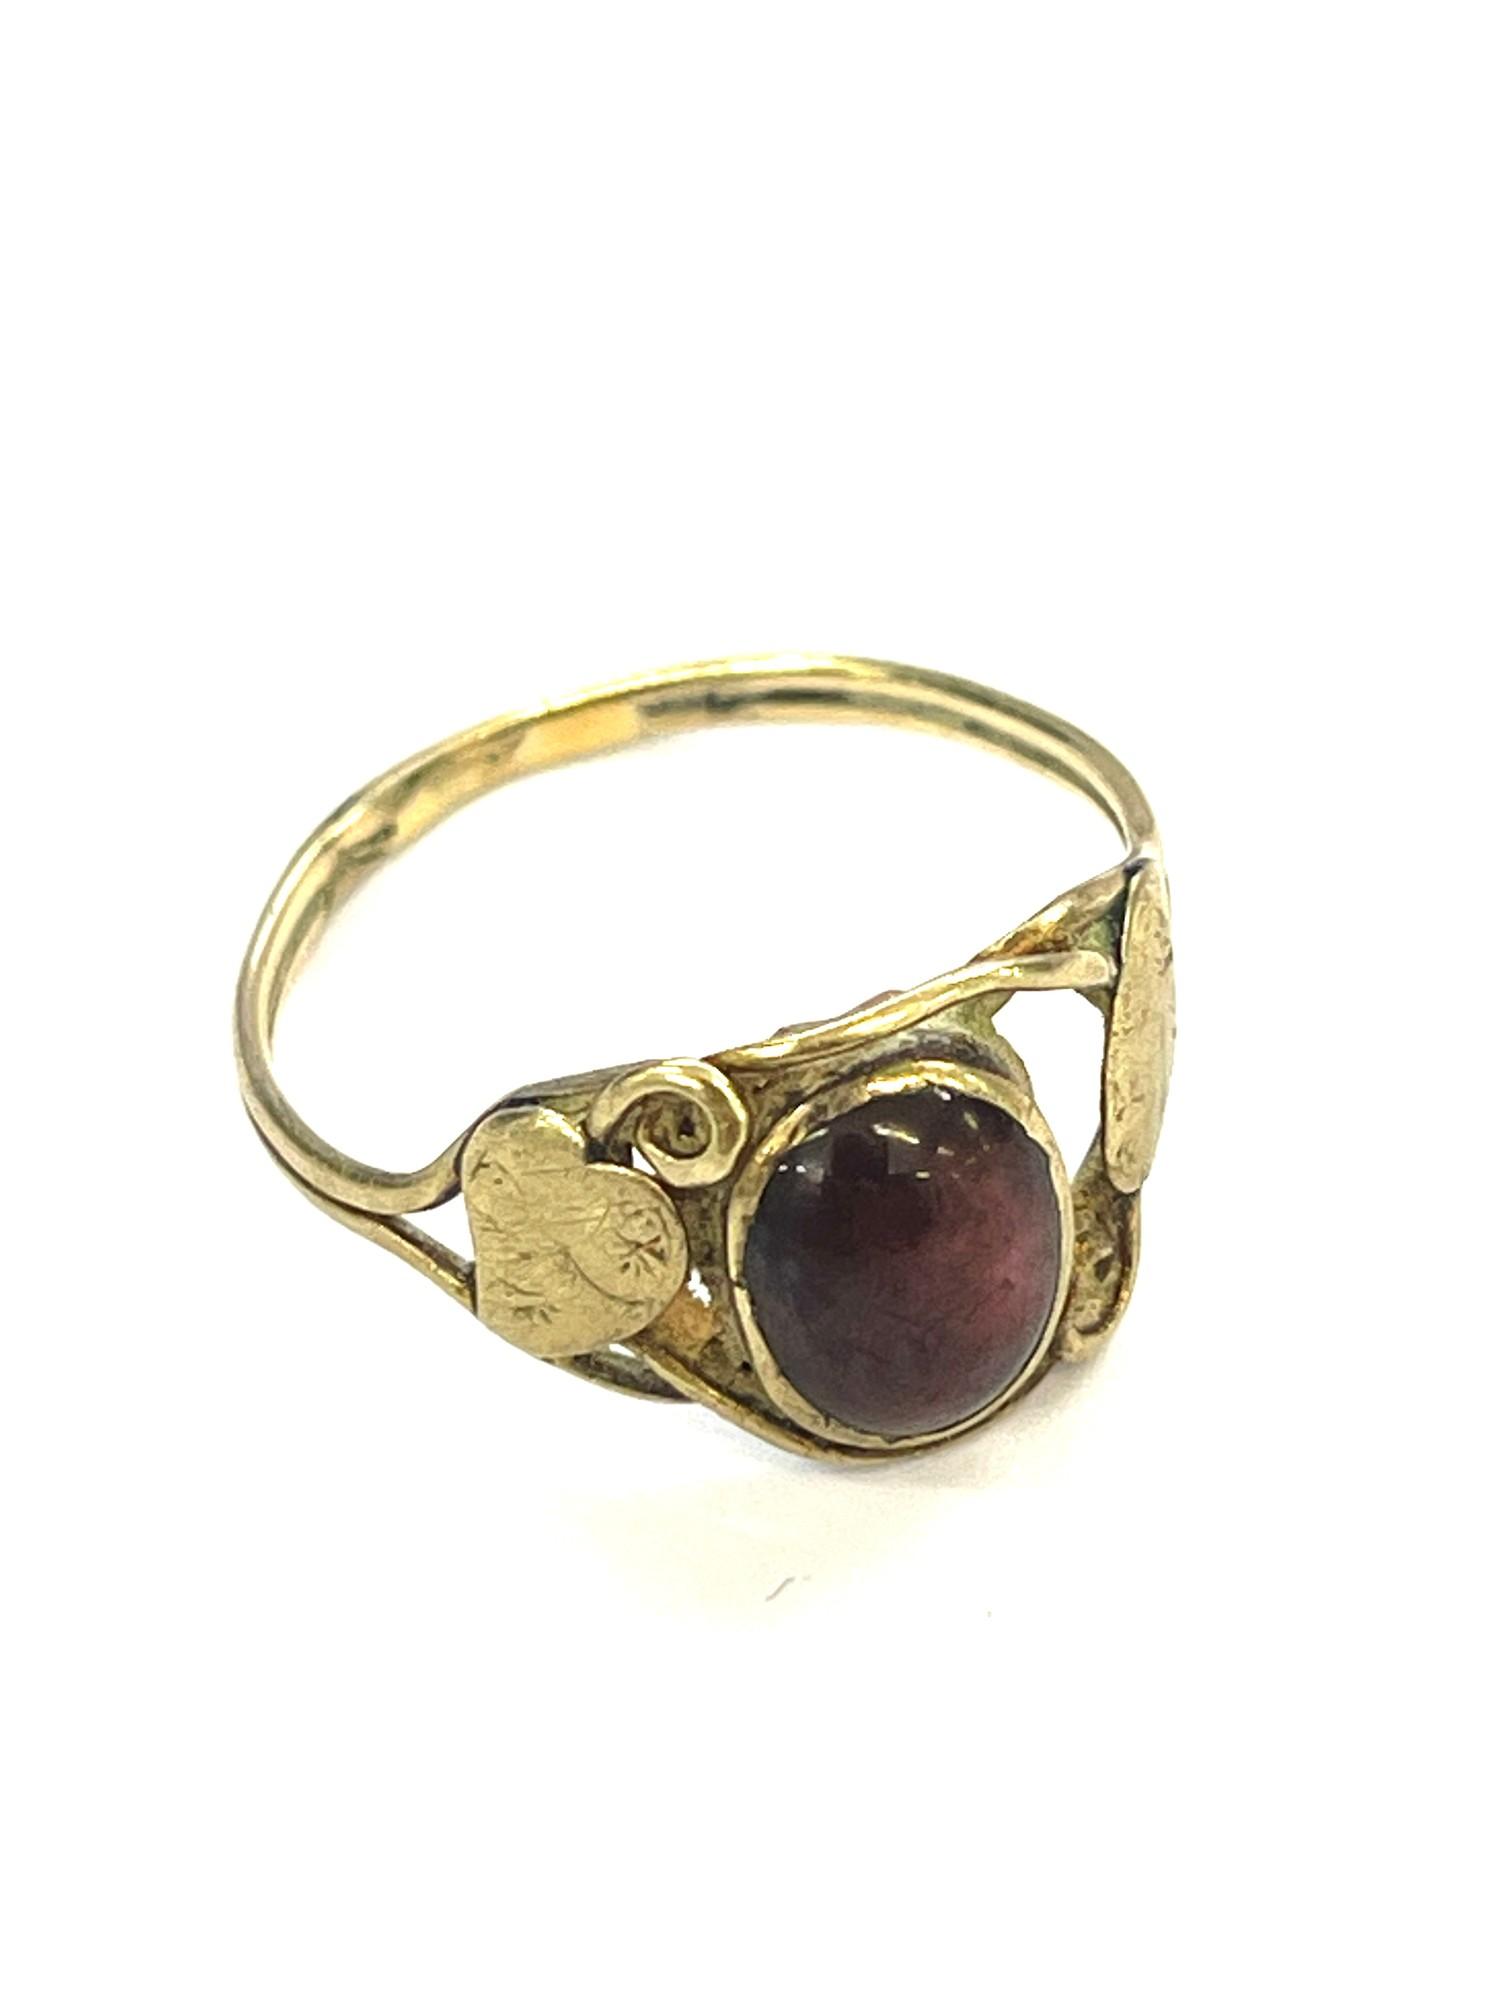 9ct Gold antique arts & crafts garnet ring - Image 3 of 3